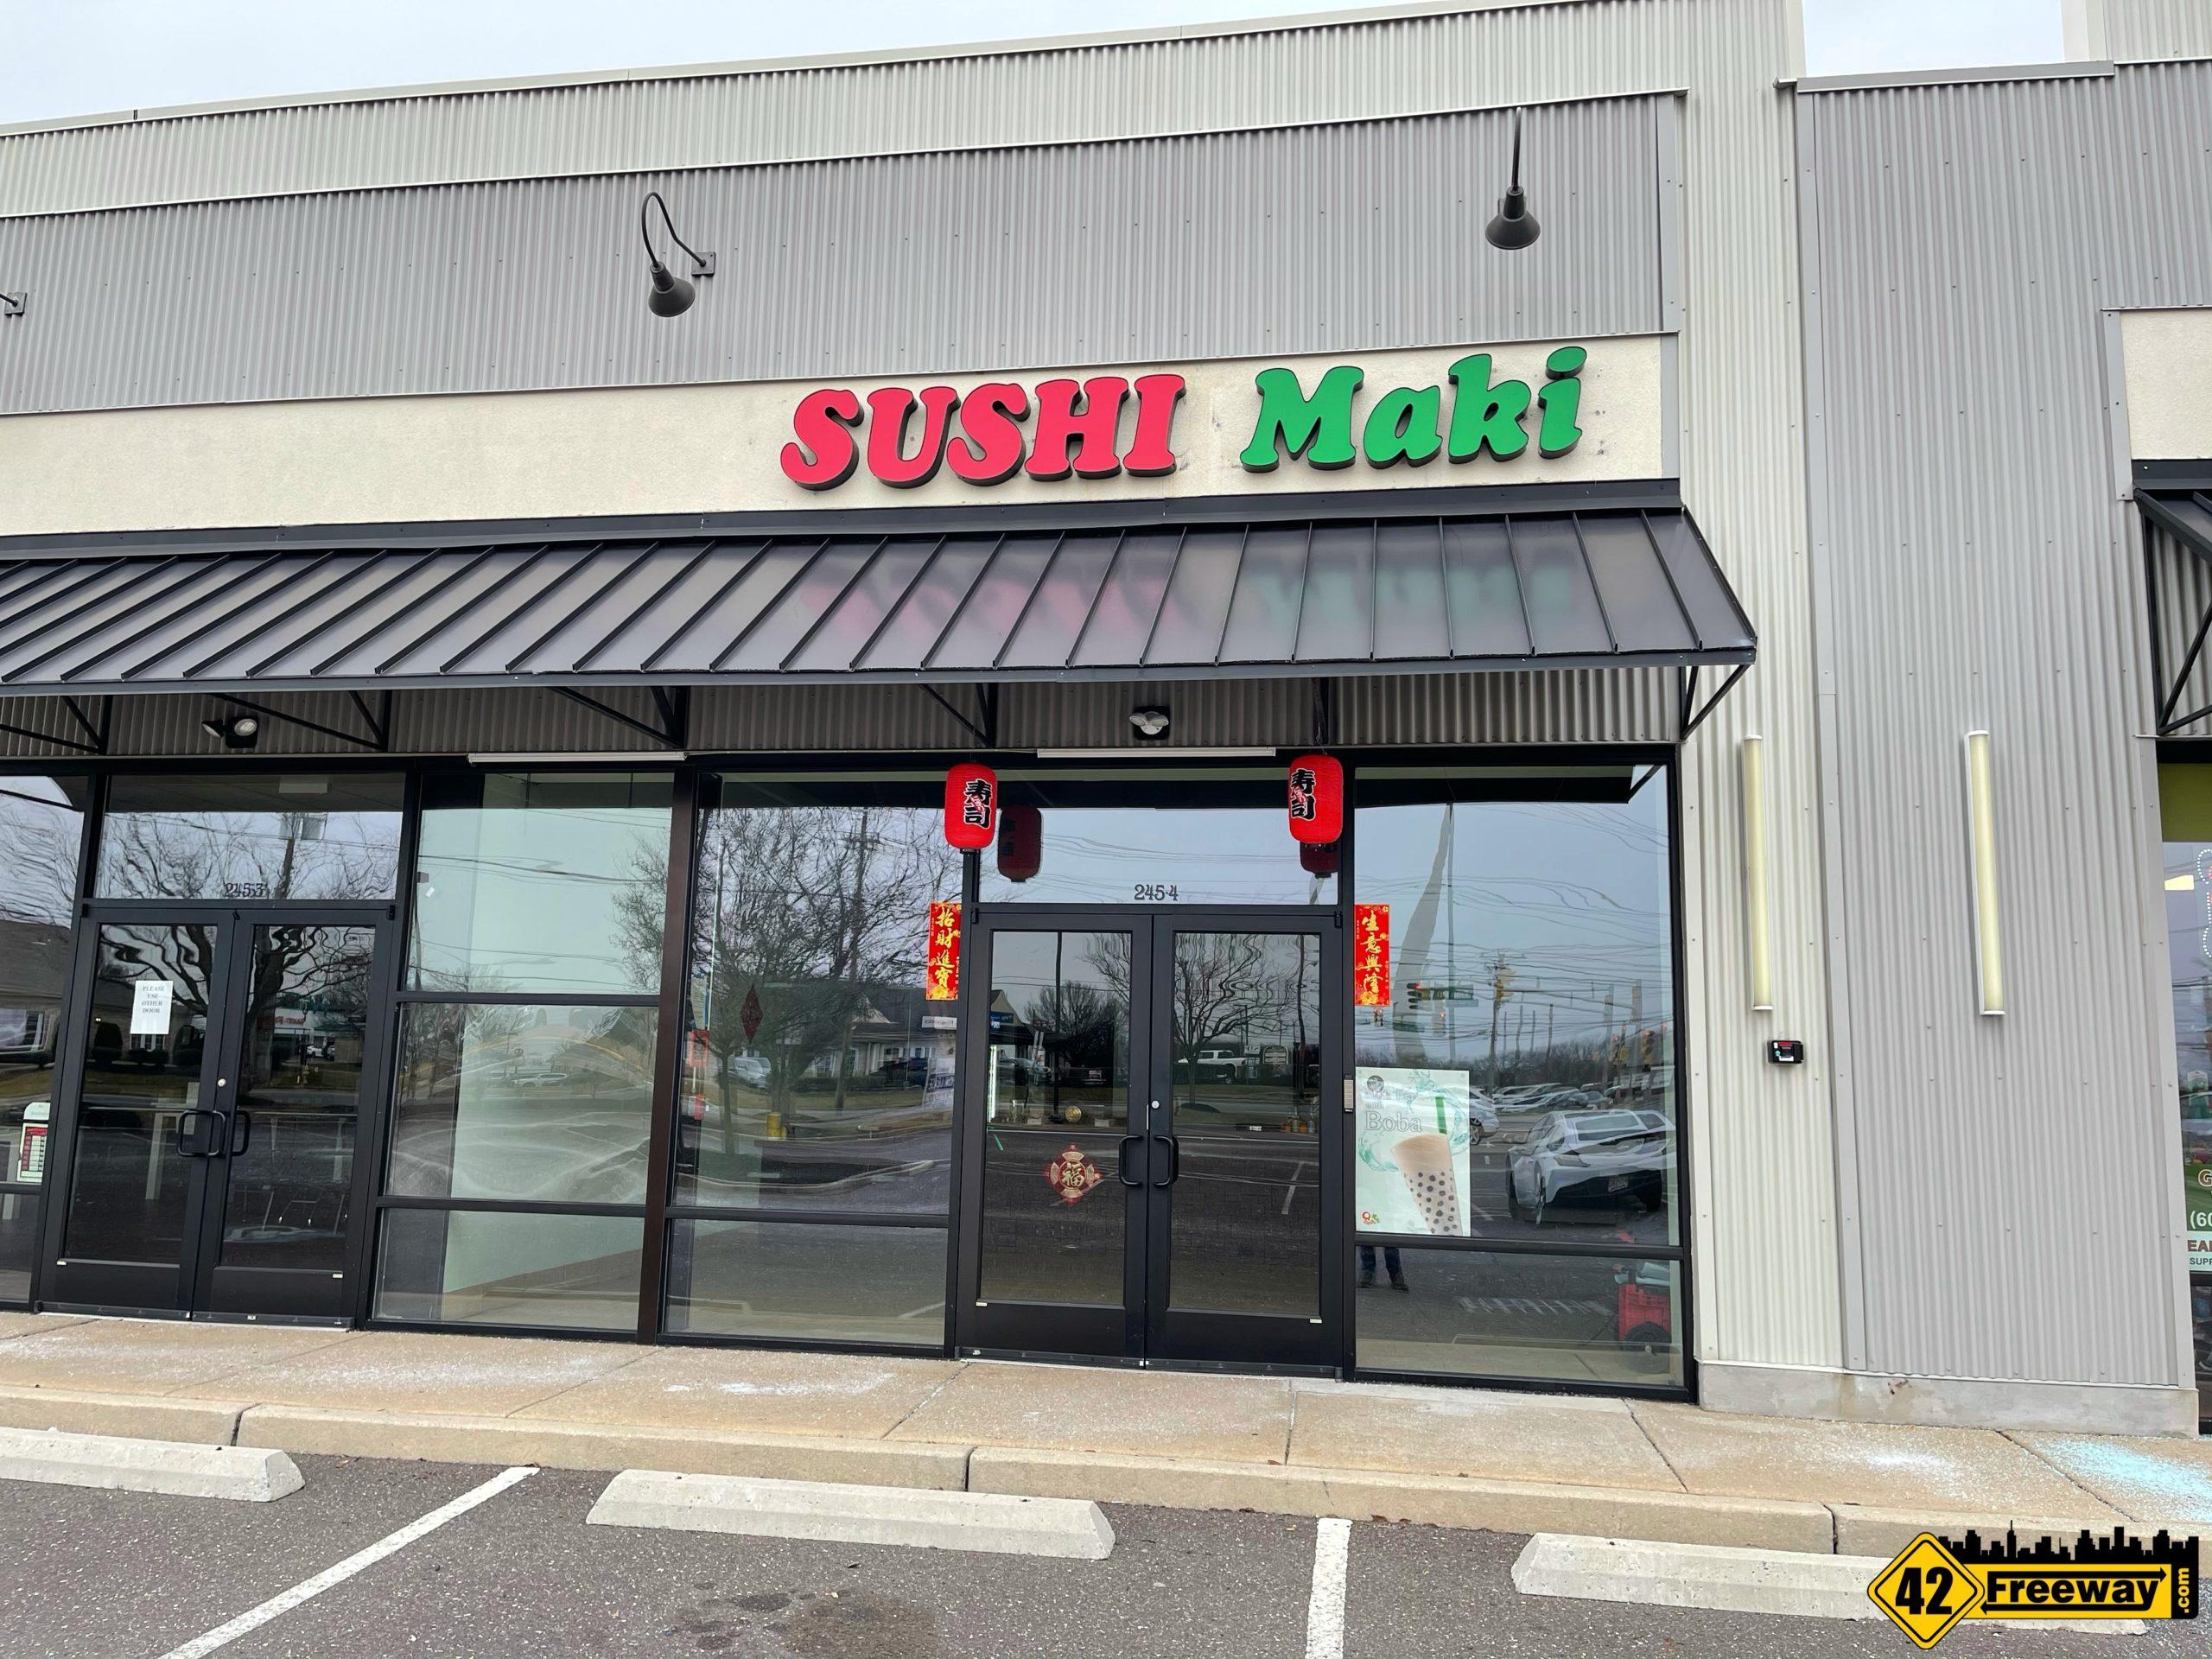 Sushi Maki Turnersville is OPEN on Fries Mill Road!  Sushi, Milk Tea and Hibachi!